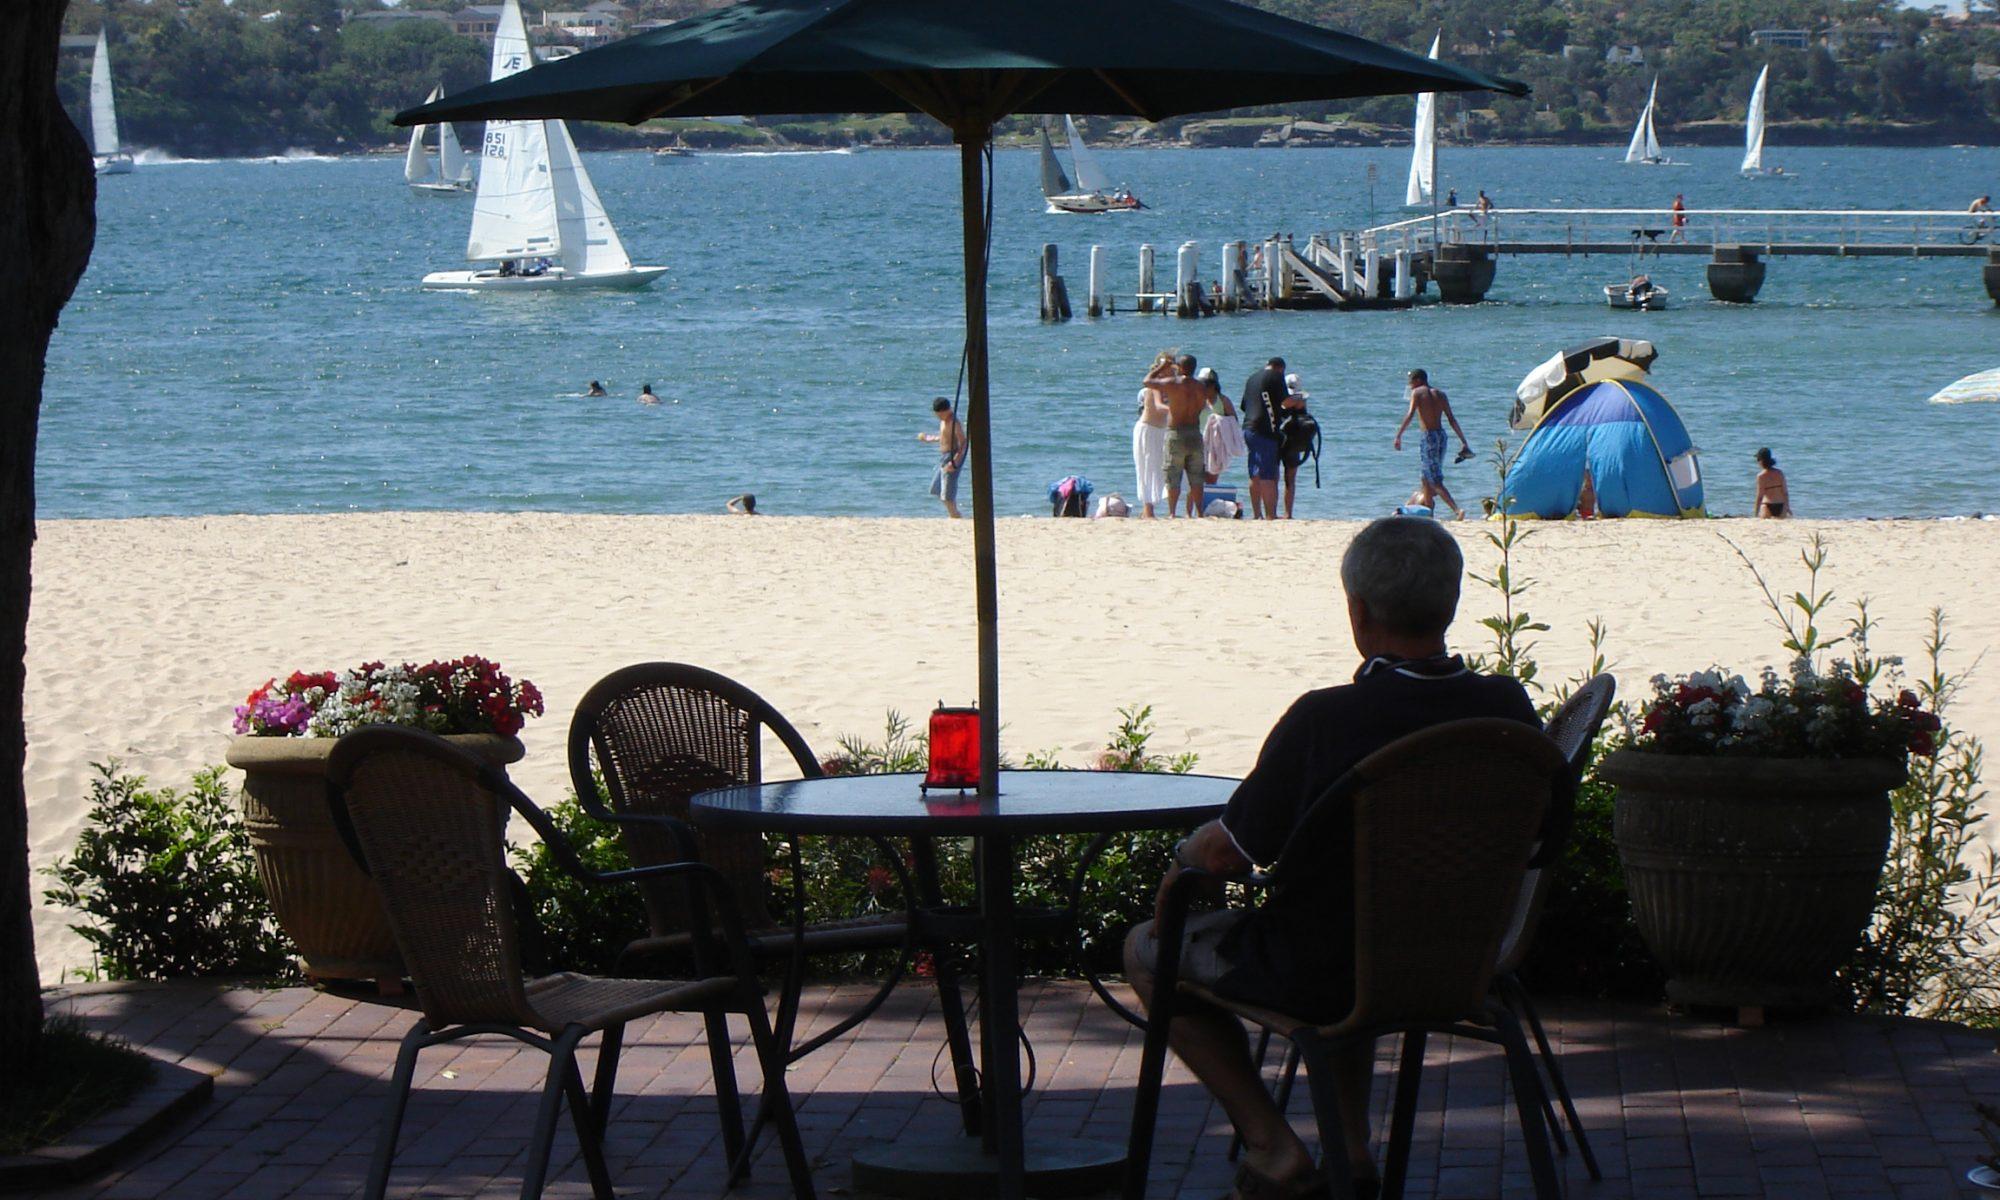 Bundeen accommodation Beachhaven Bed & Breakfast beach front view